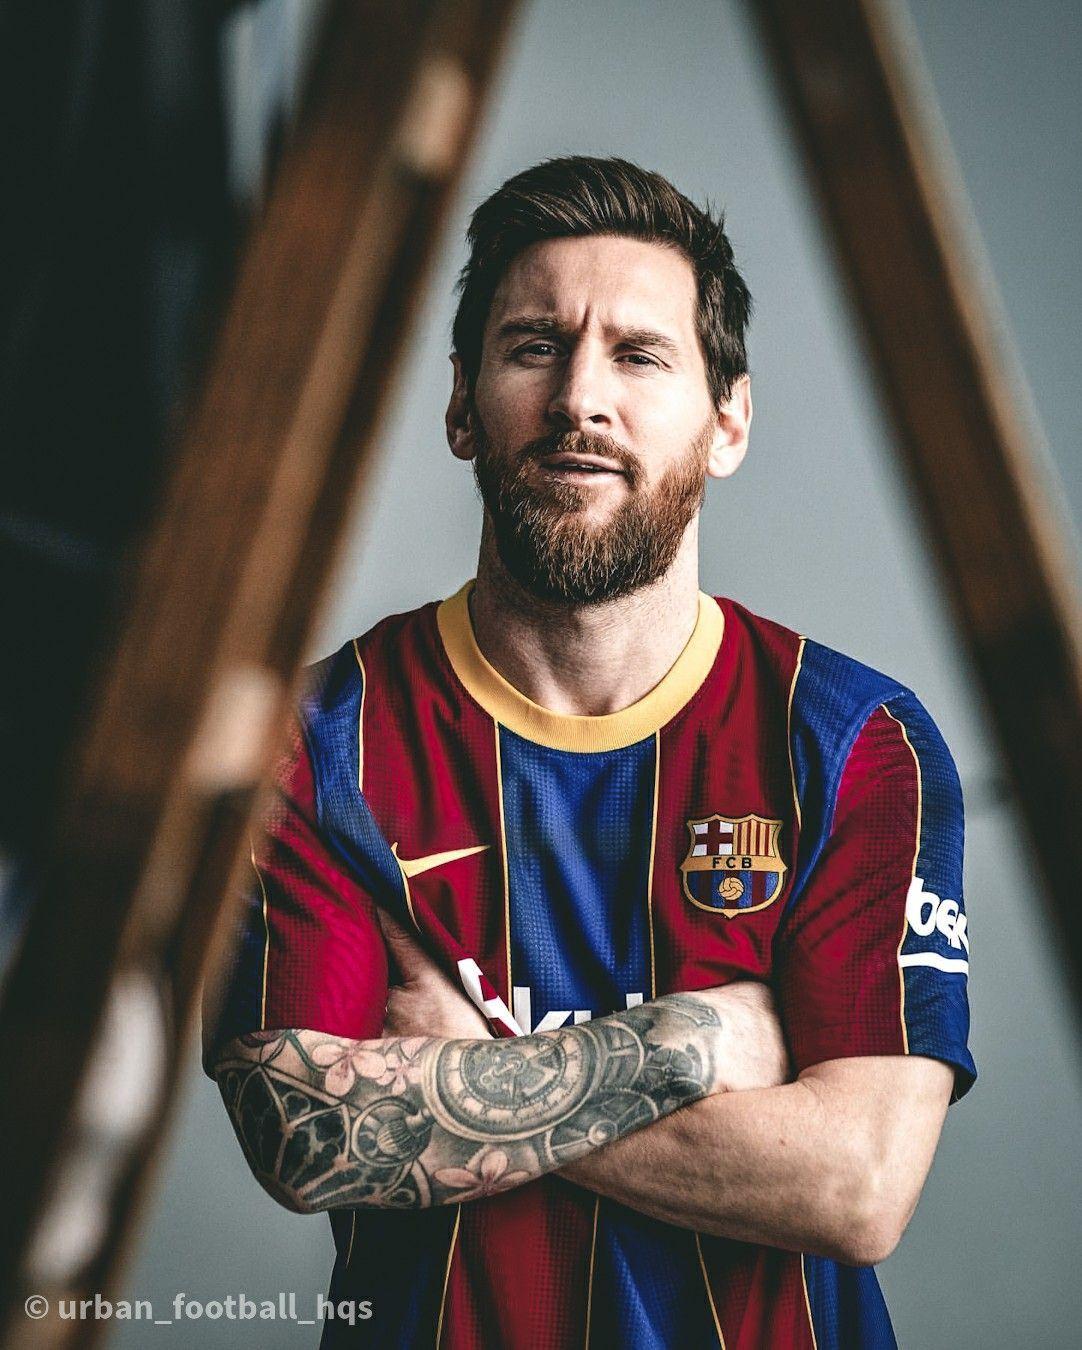 FC Barcelona Team 2021 Wallpapers - Wallpaper Cave